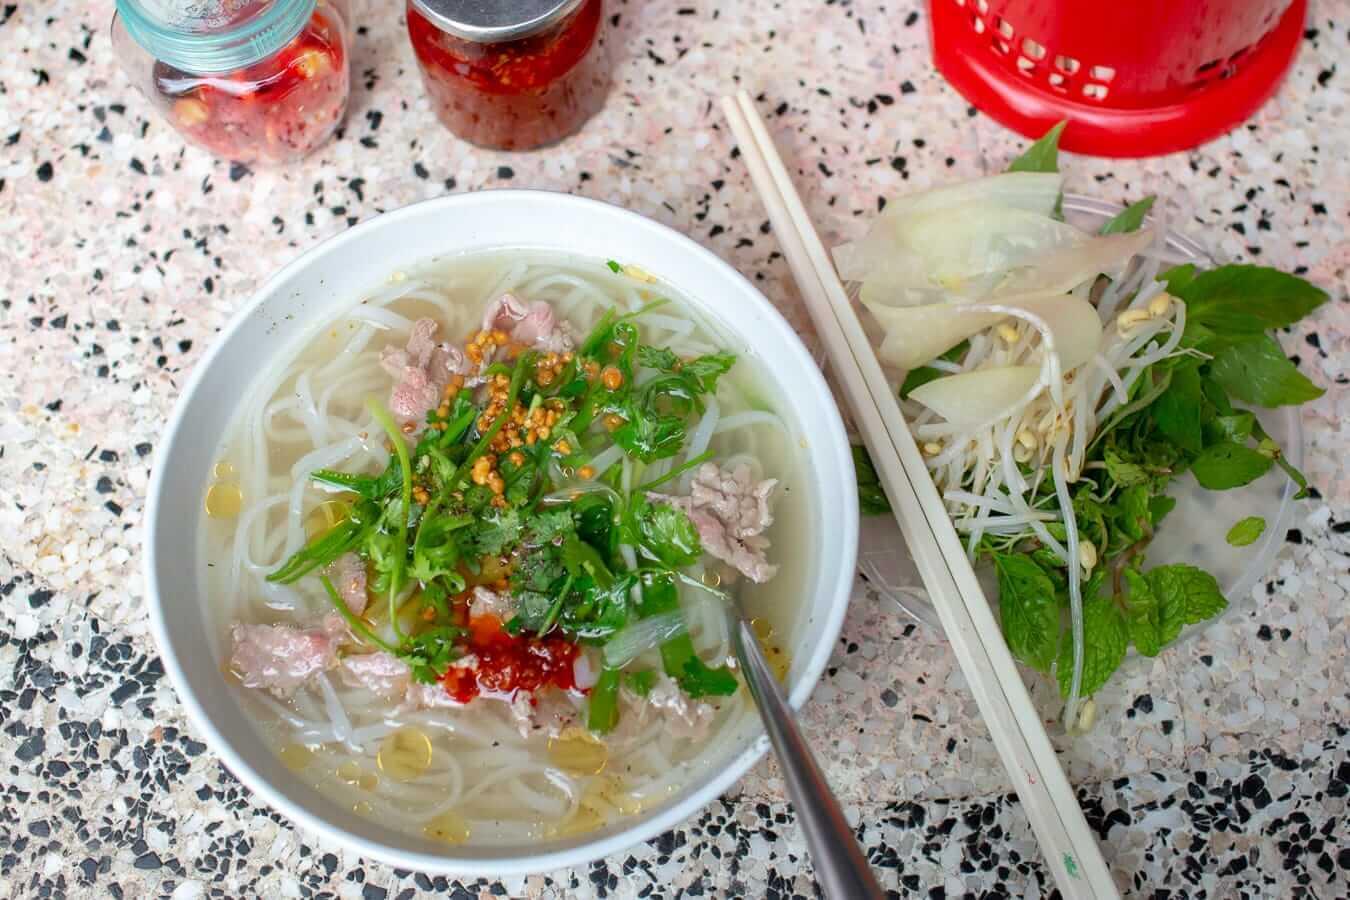 Pho Tung's pho bo: Best Pho in Hoi An